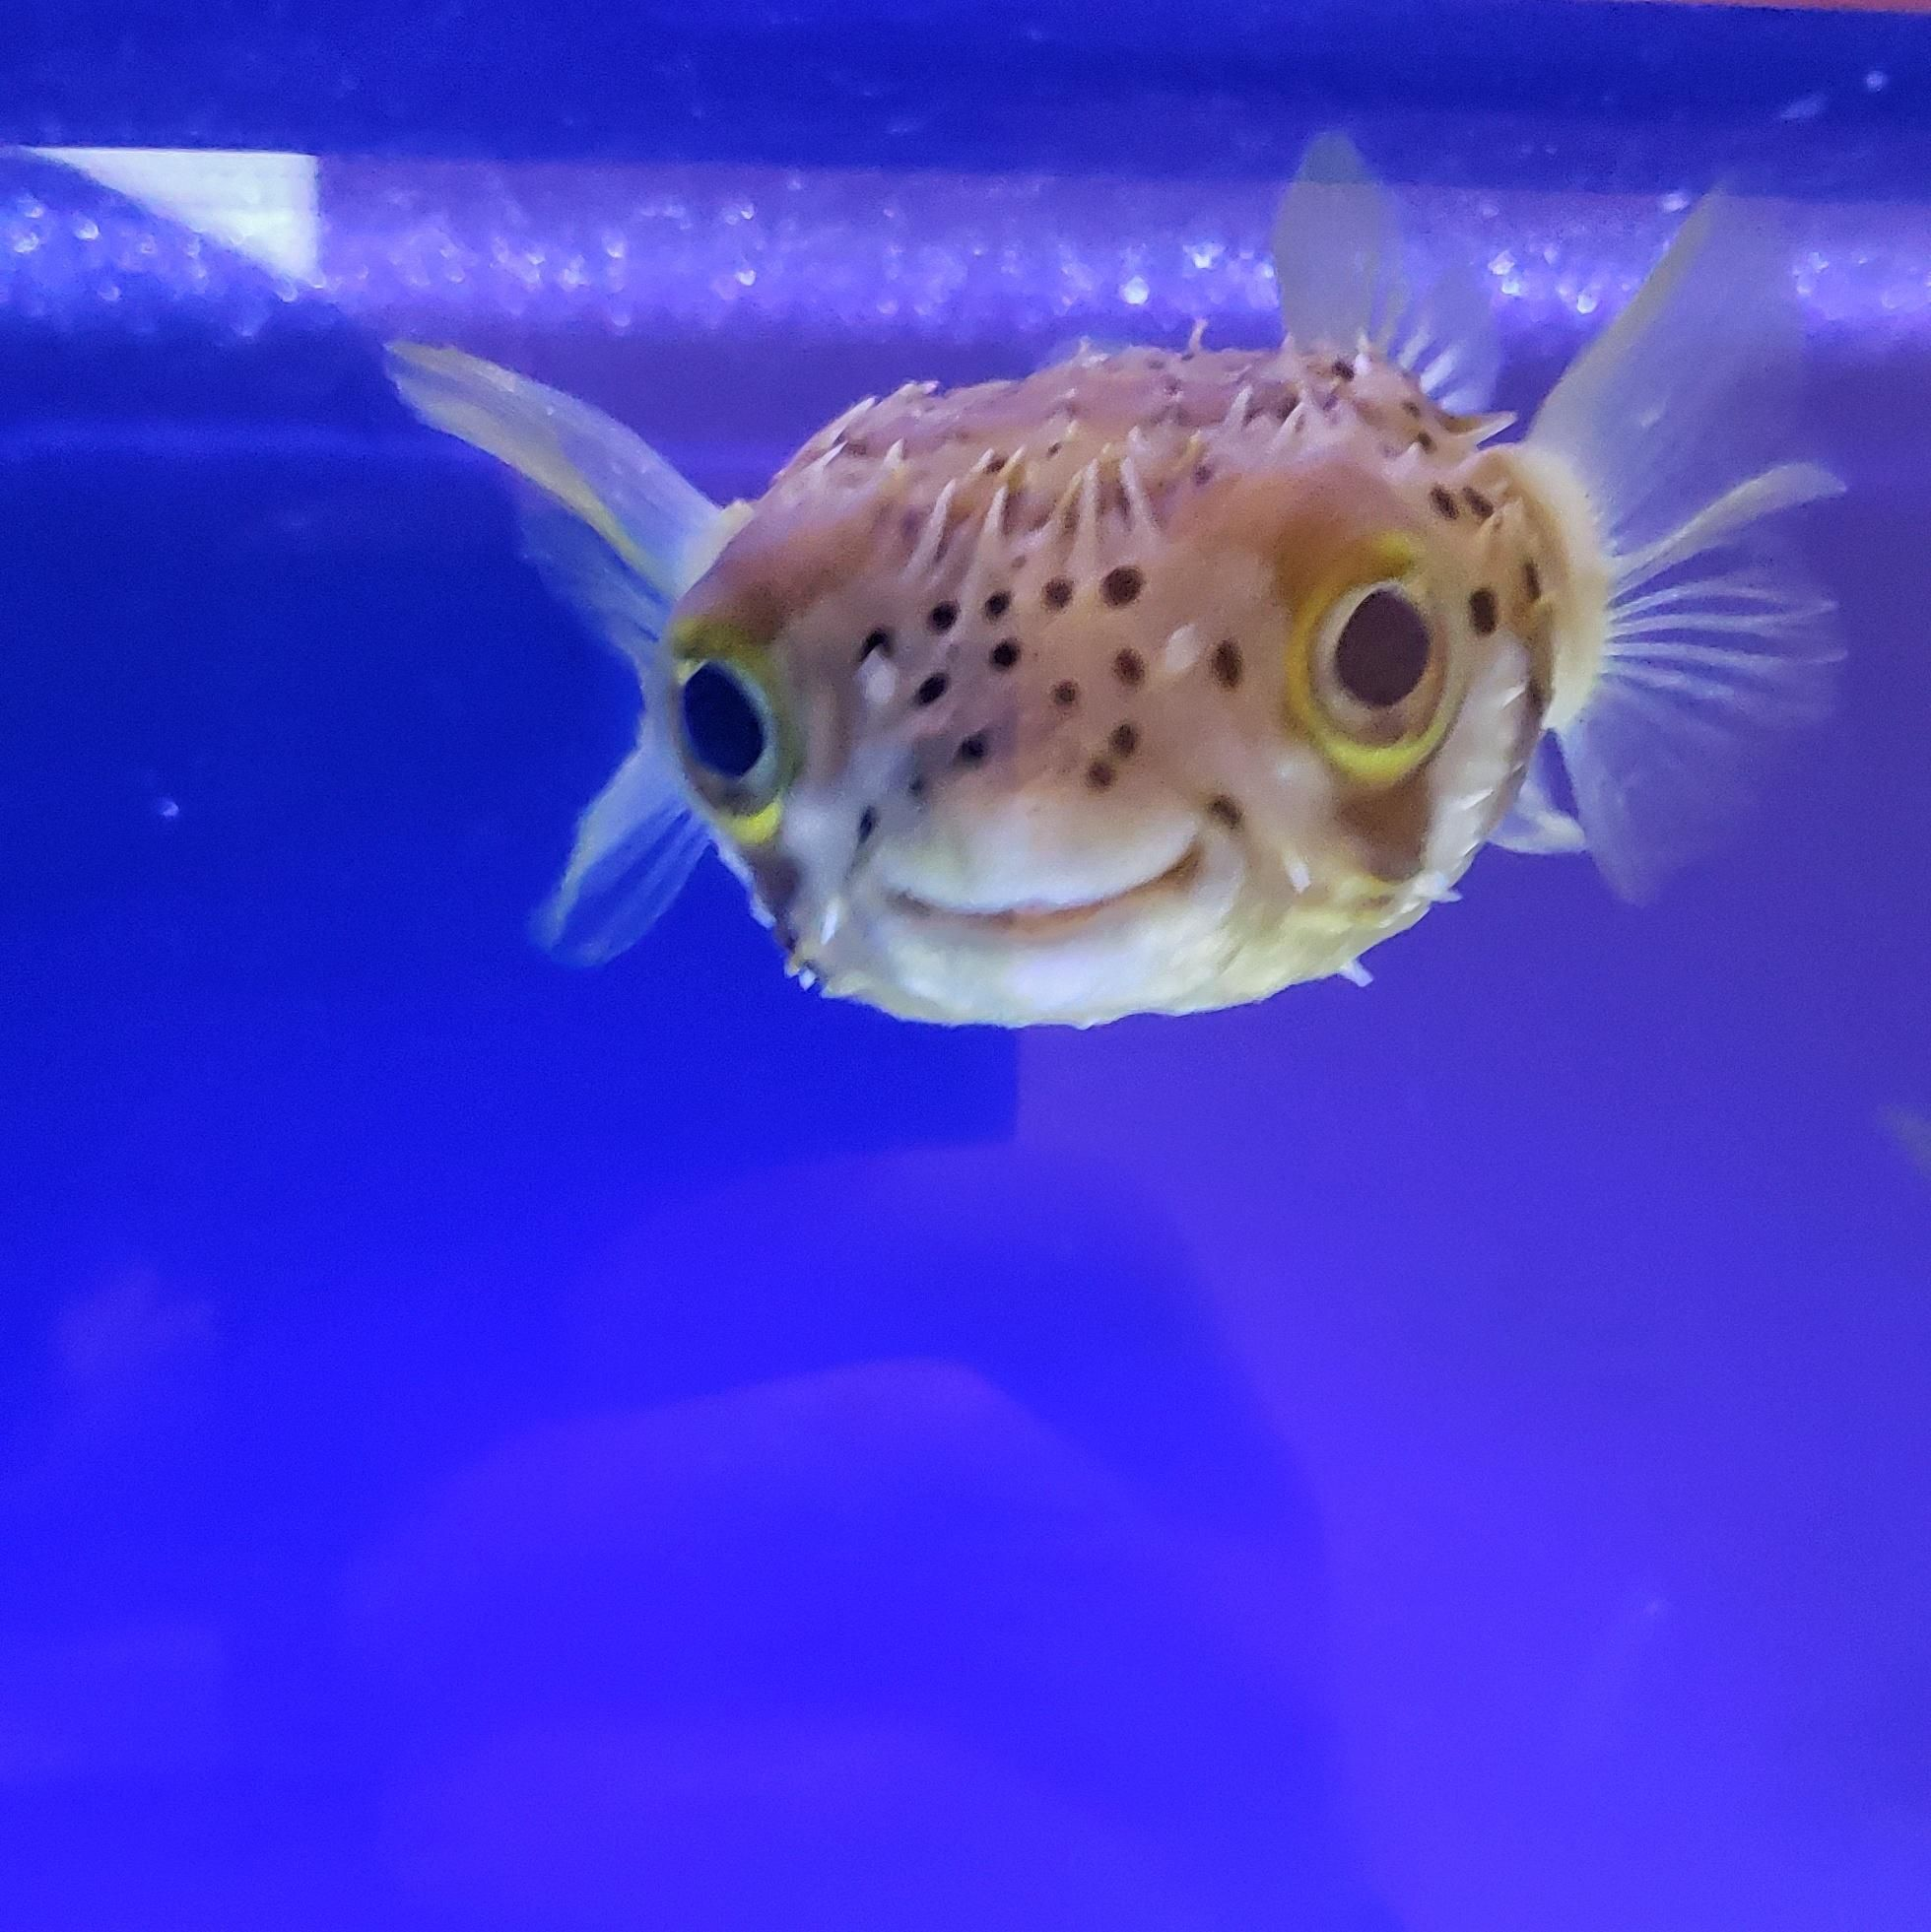 This Smiling Puffer Fish At My Kids School Http Bit Ly 2r91p0m Puffer Fish Cute Fish Fish